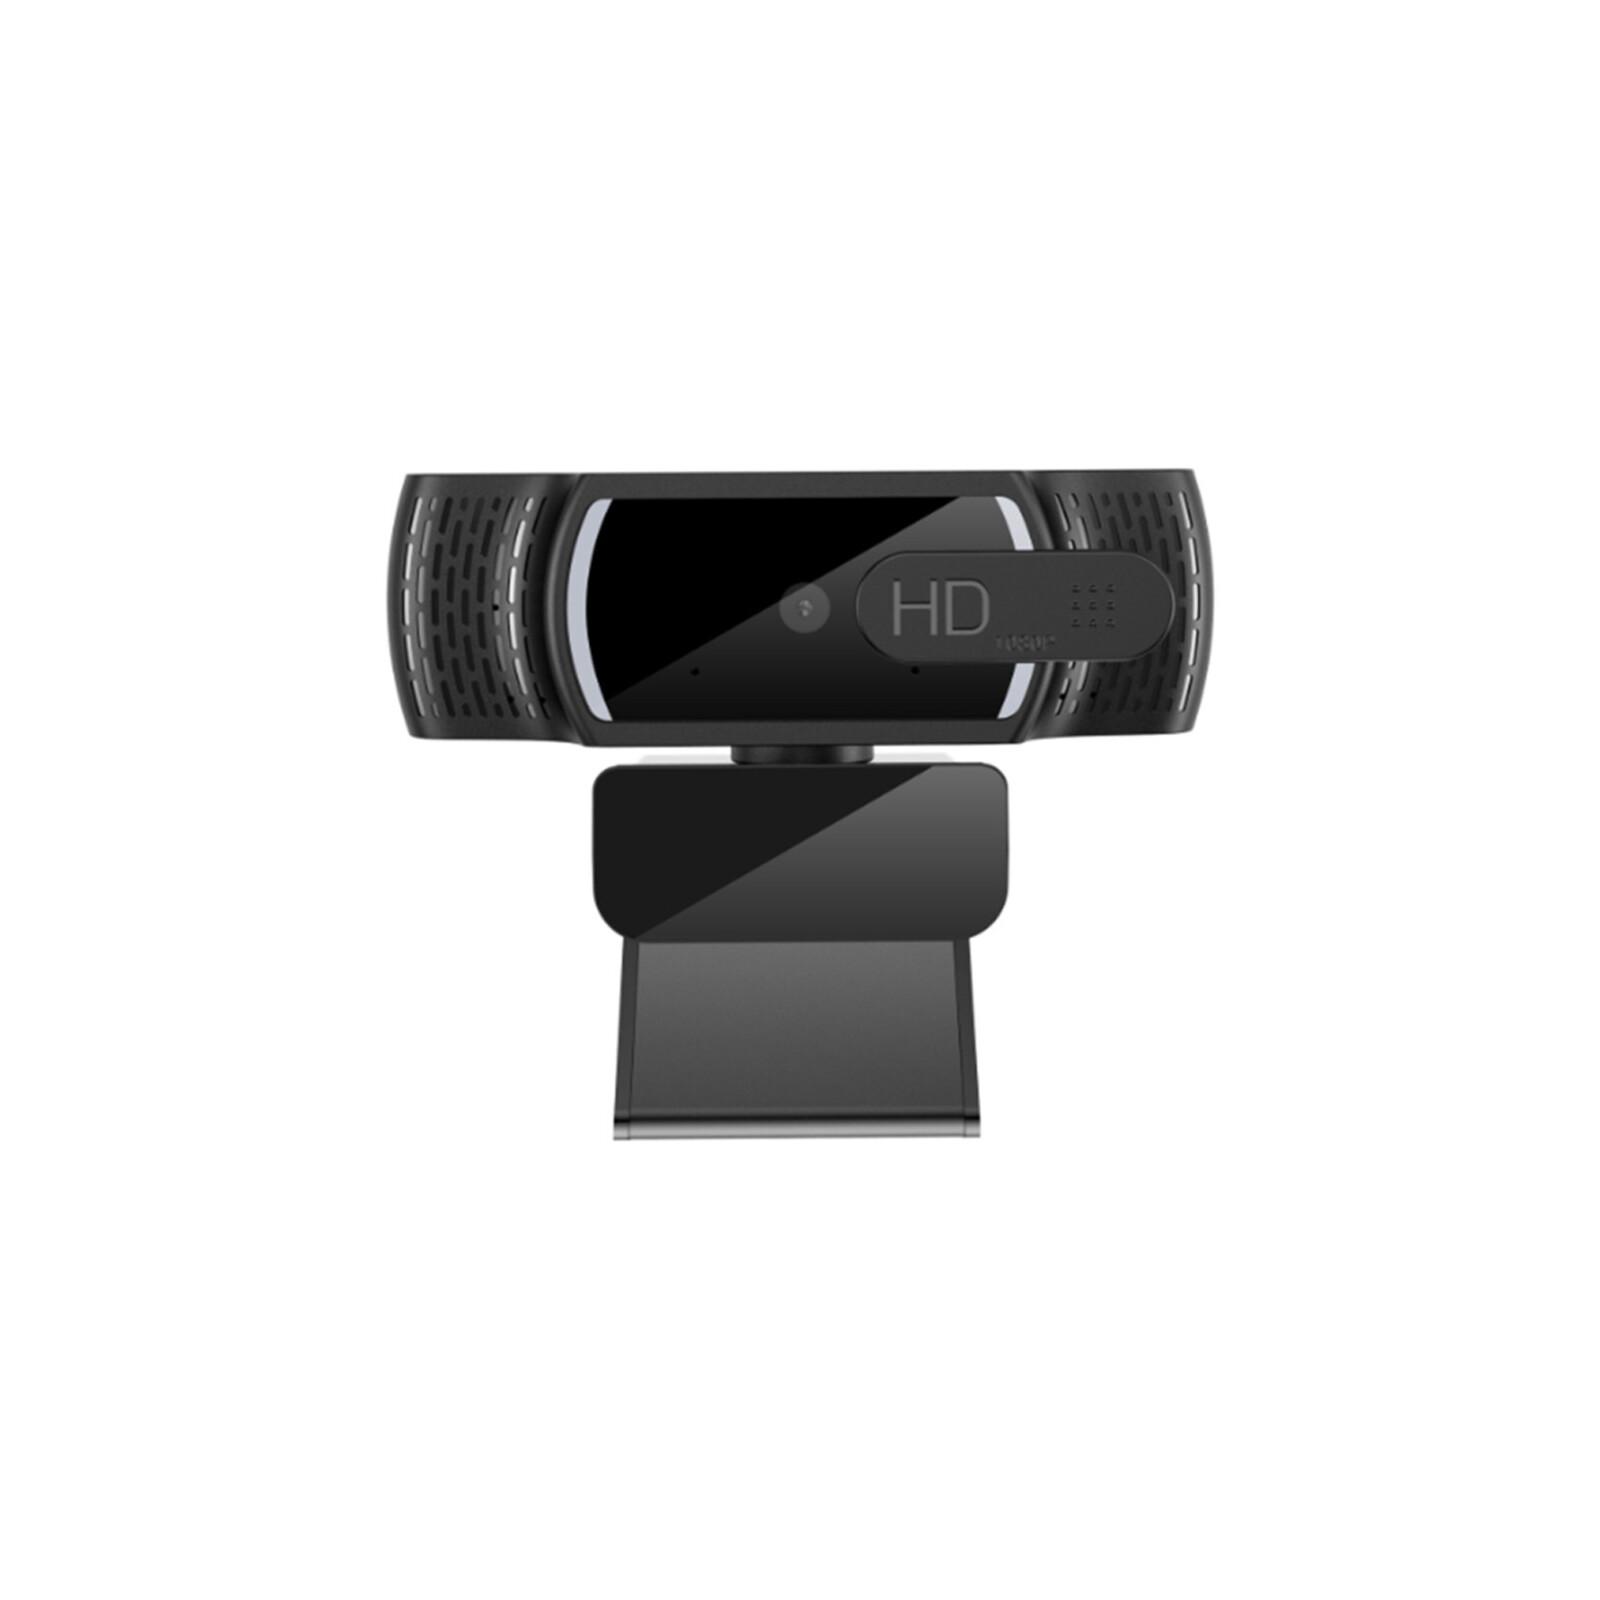 Axxtra Webcam Full-HD - Plug and Play